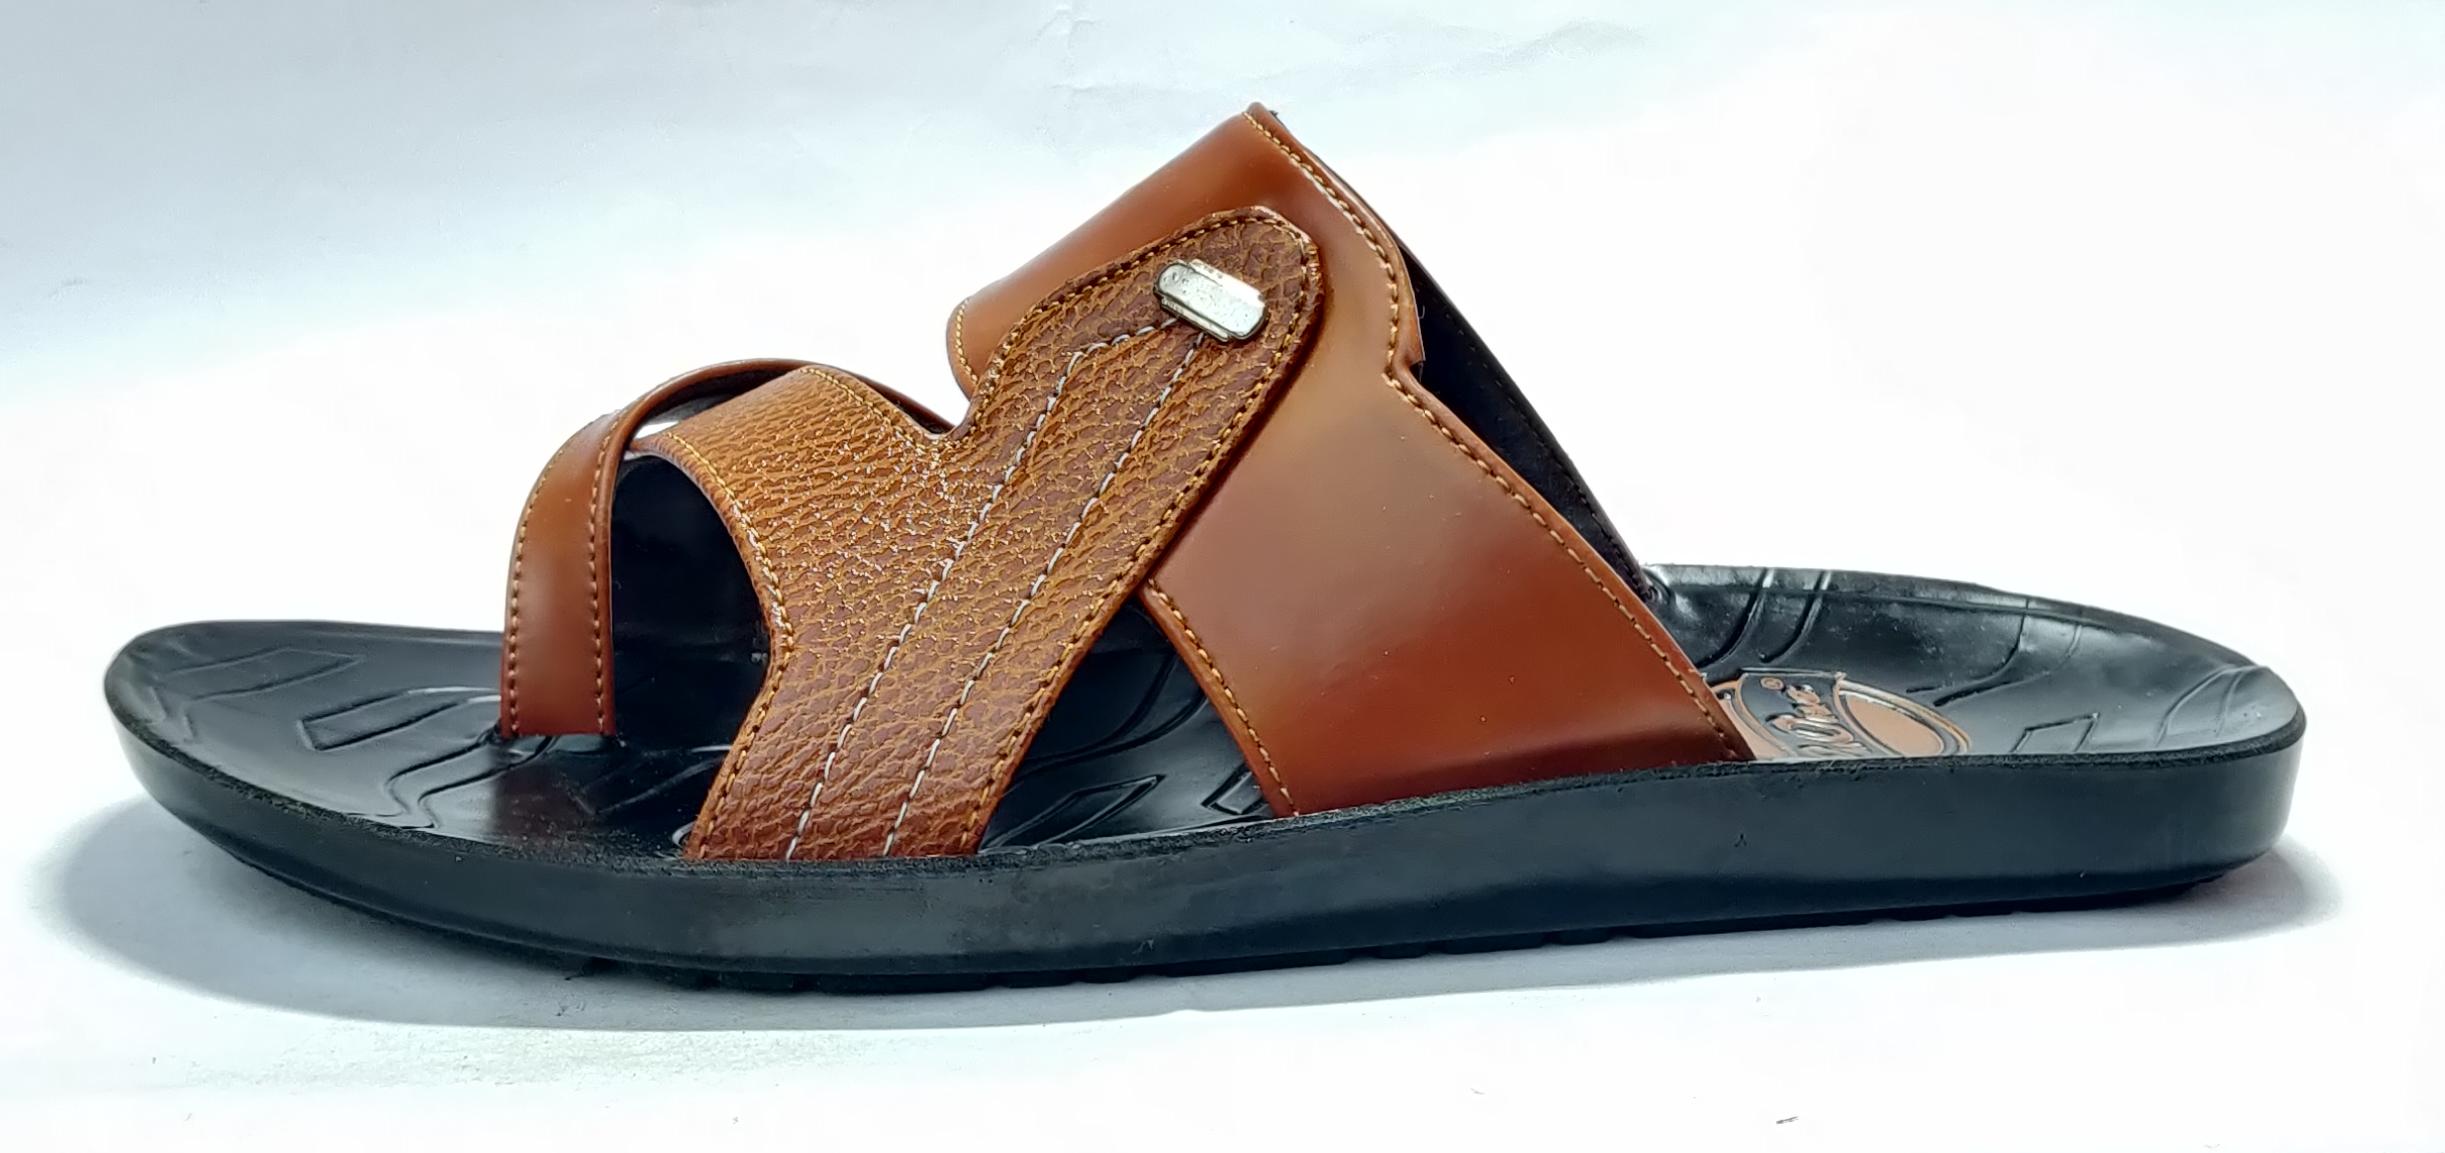 Blue Pop Stylish Comfortable & Trendy Men's Pu Slippers P253 (Tan, 7-10, 8 PAIR)